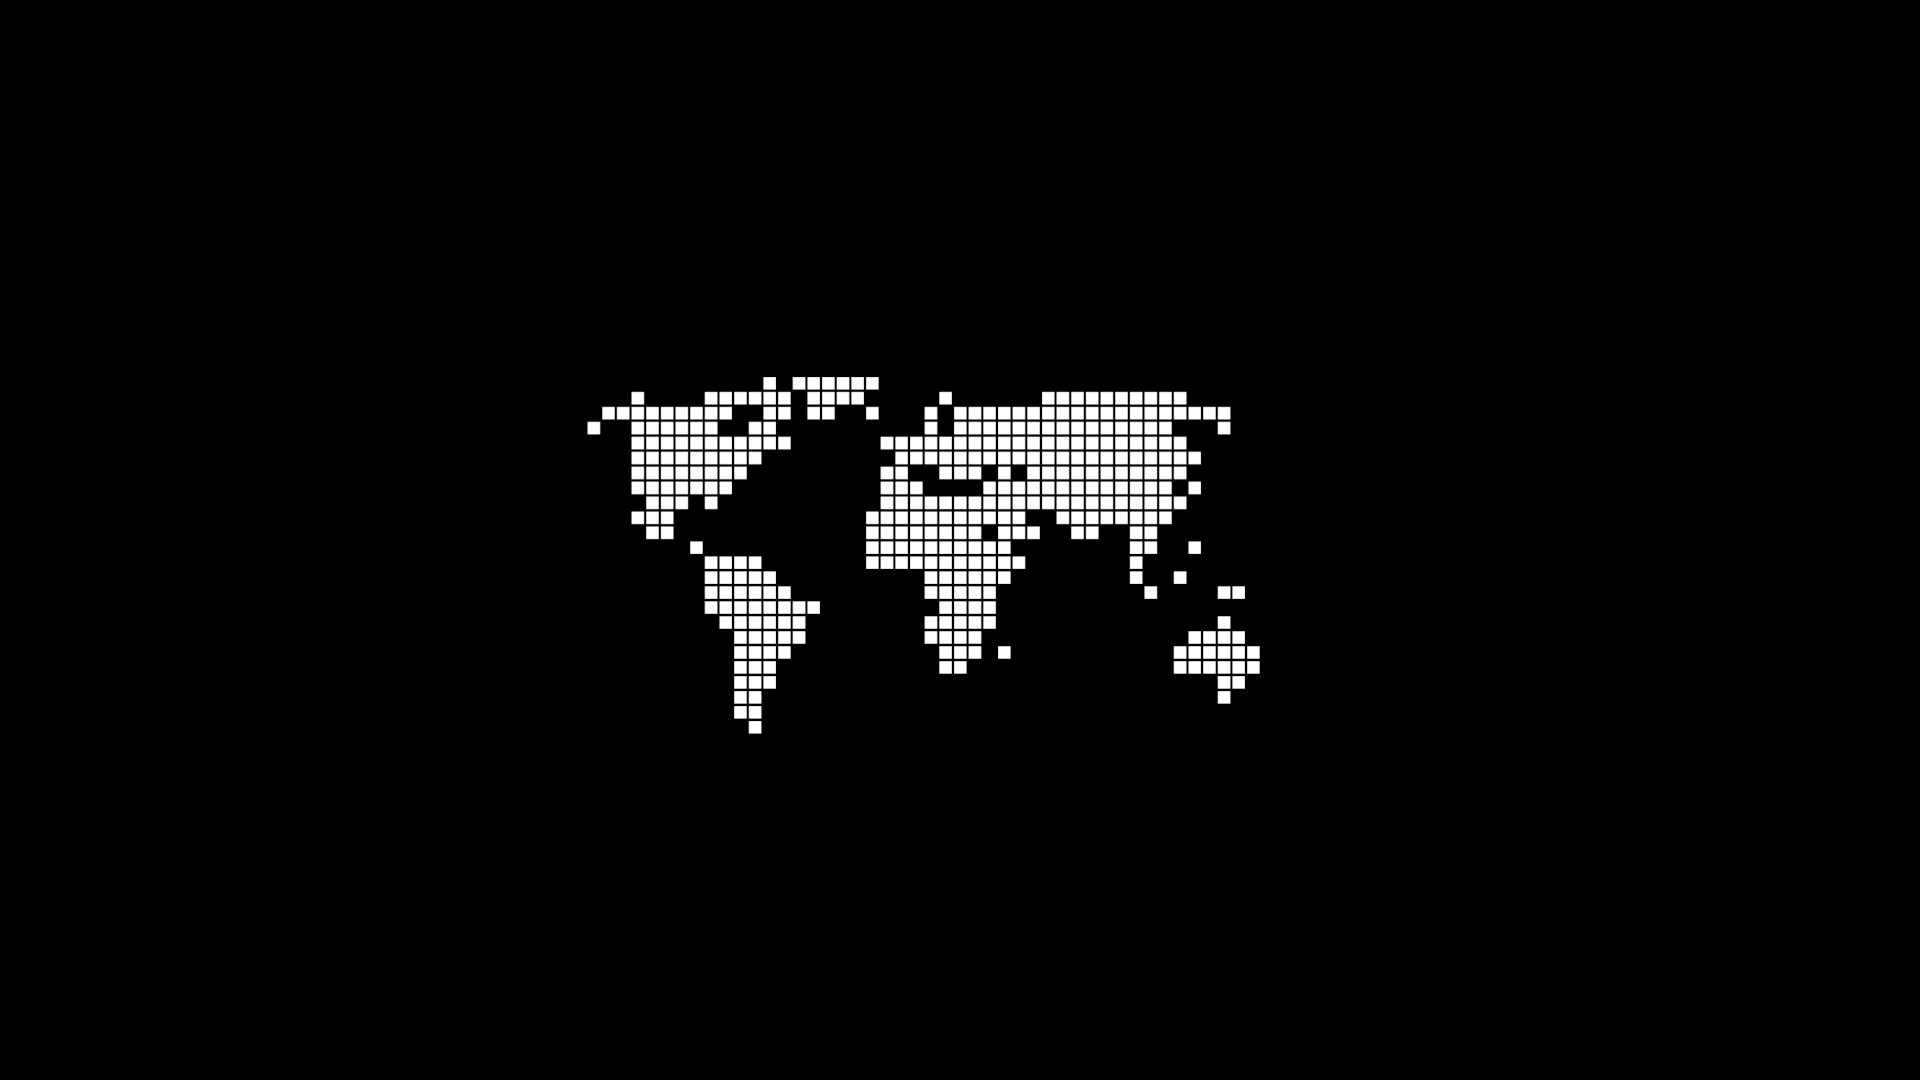 pixelworldmapwallpaper82098526hdwallpapers TechBeasts